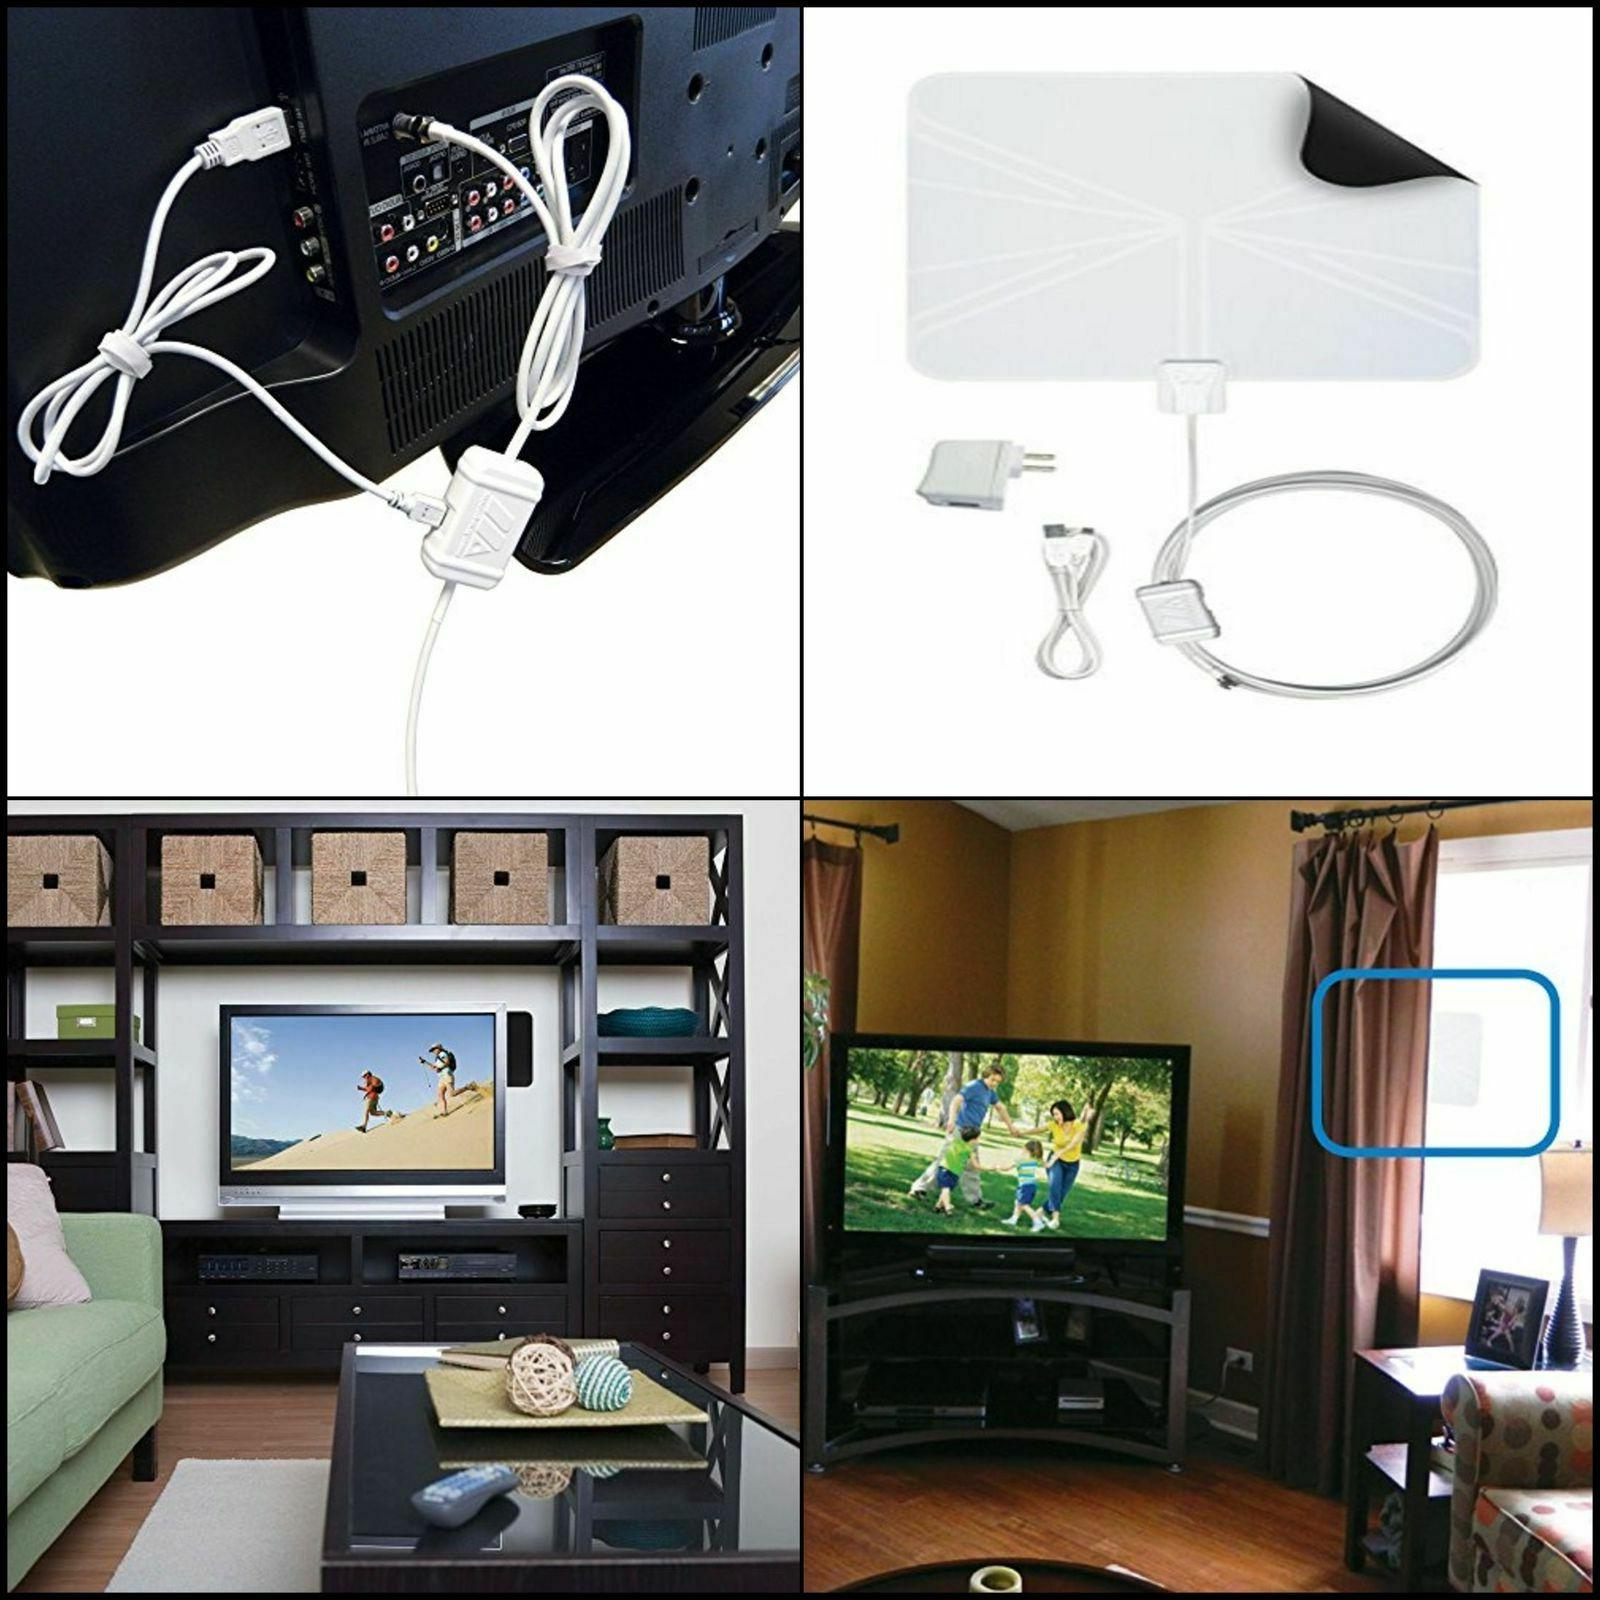 FlatWave Amped FL5500A Amplified Digital Indoor HD TV Recept